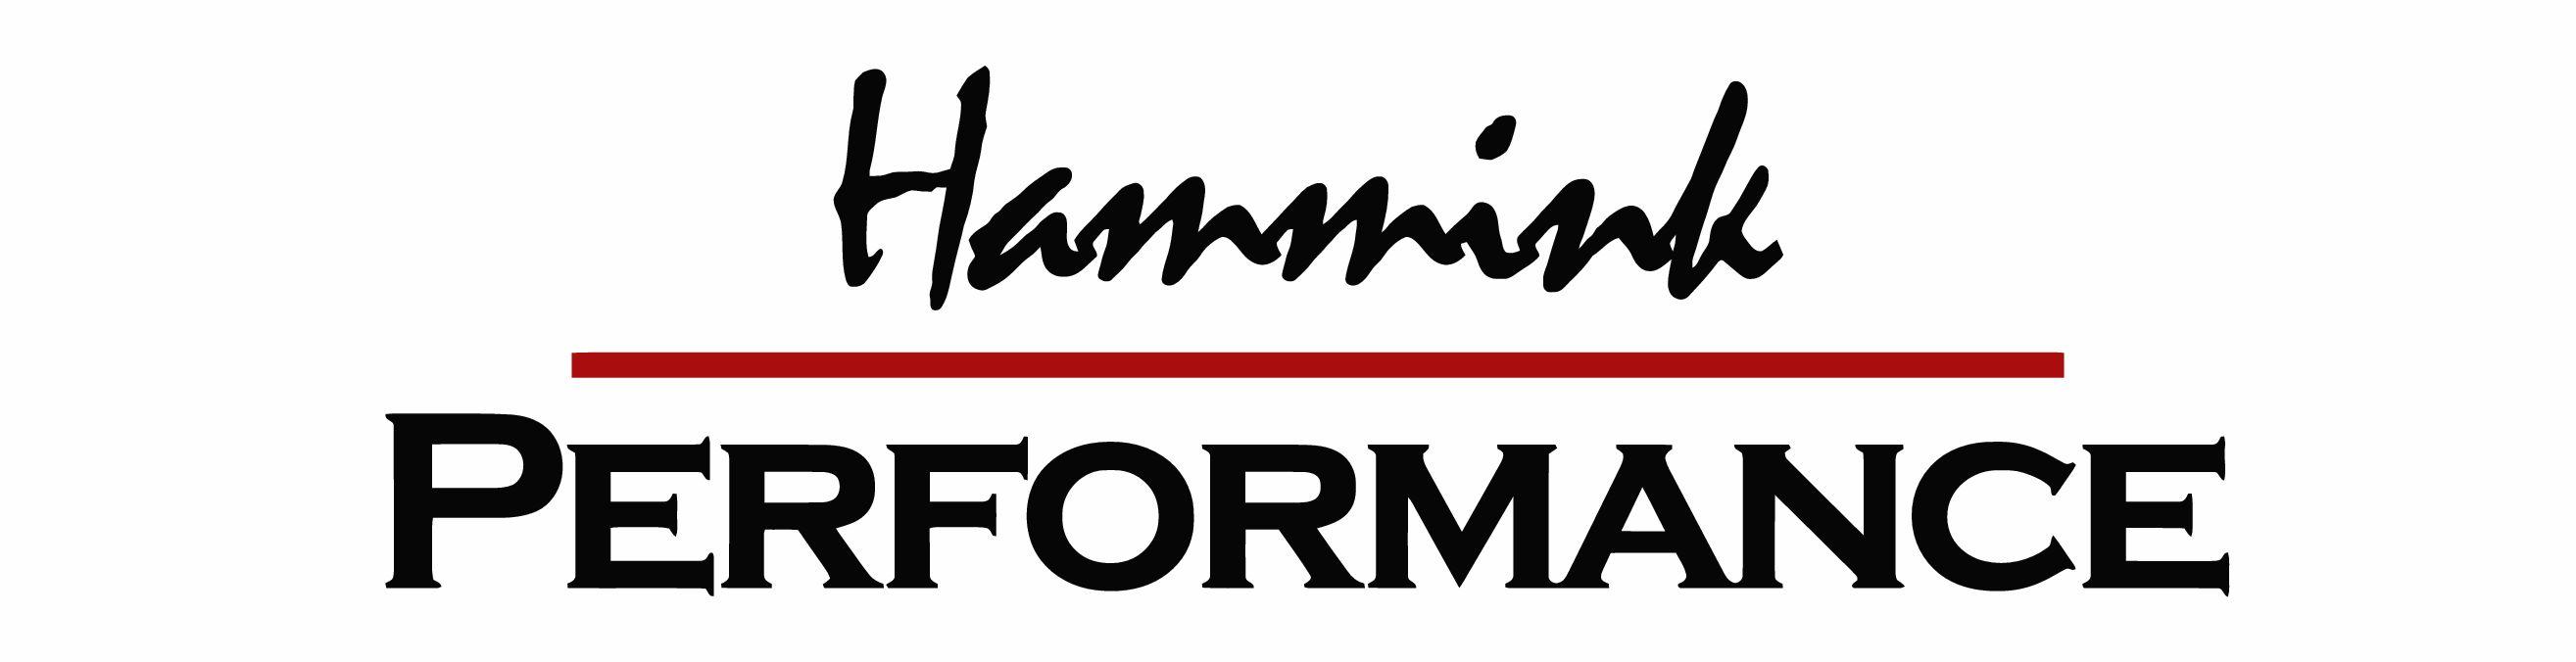 Hammink Performance